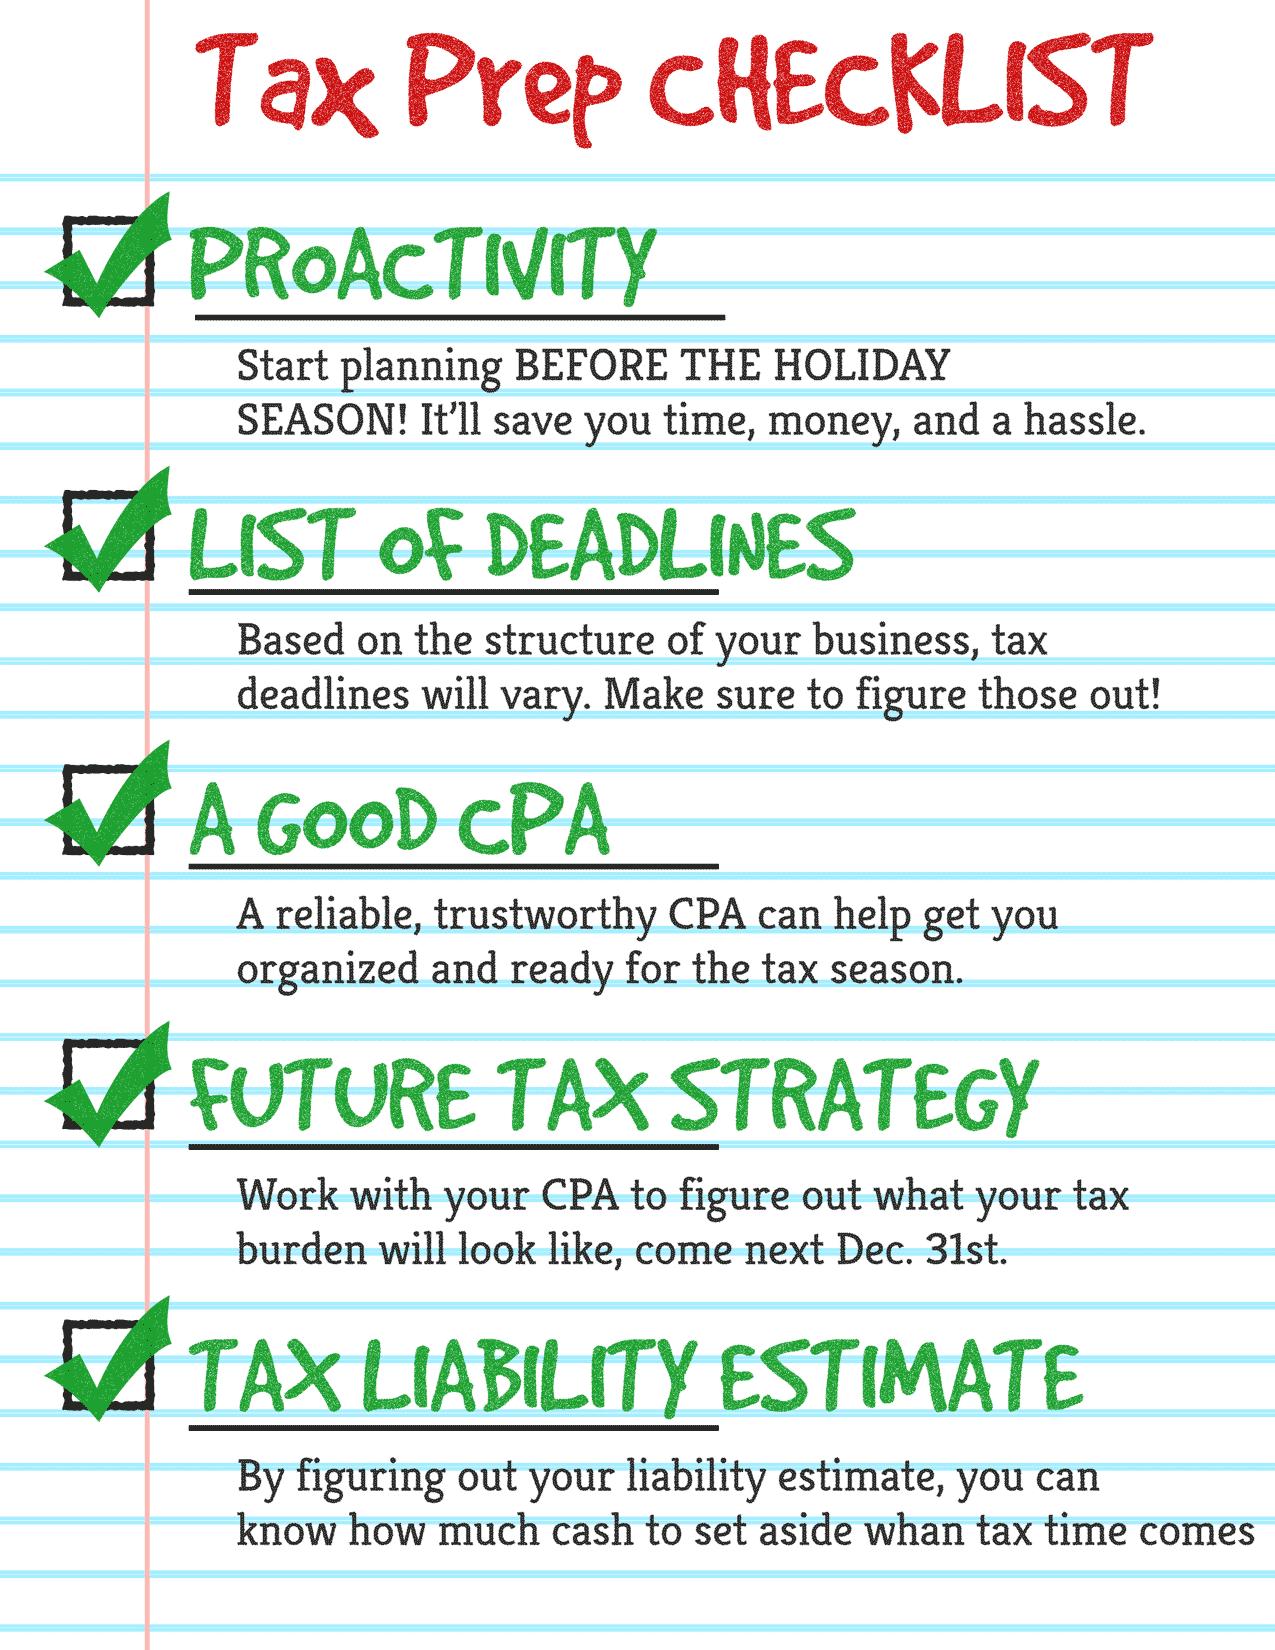 Tax-Prep-Checklist.png